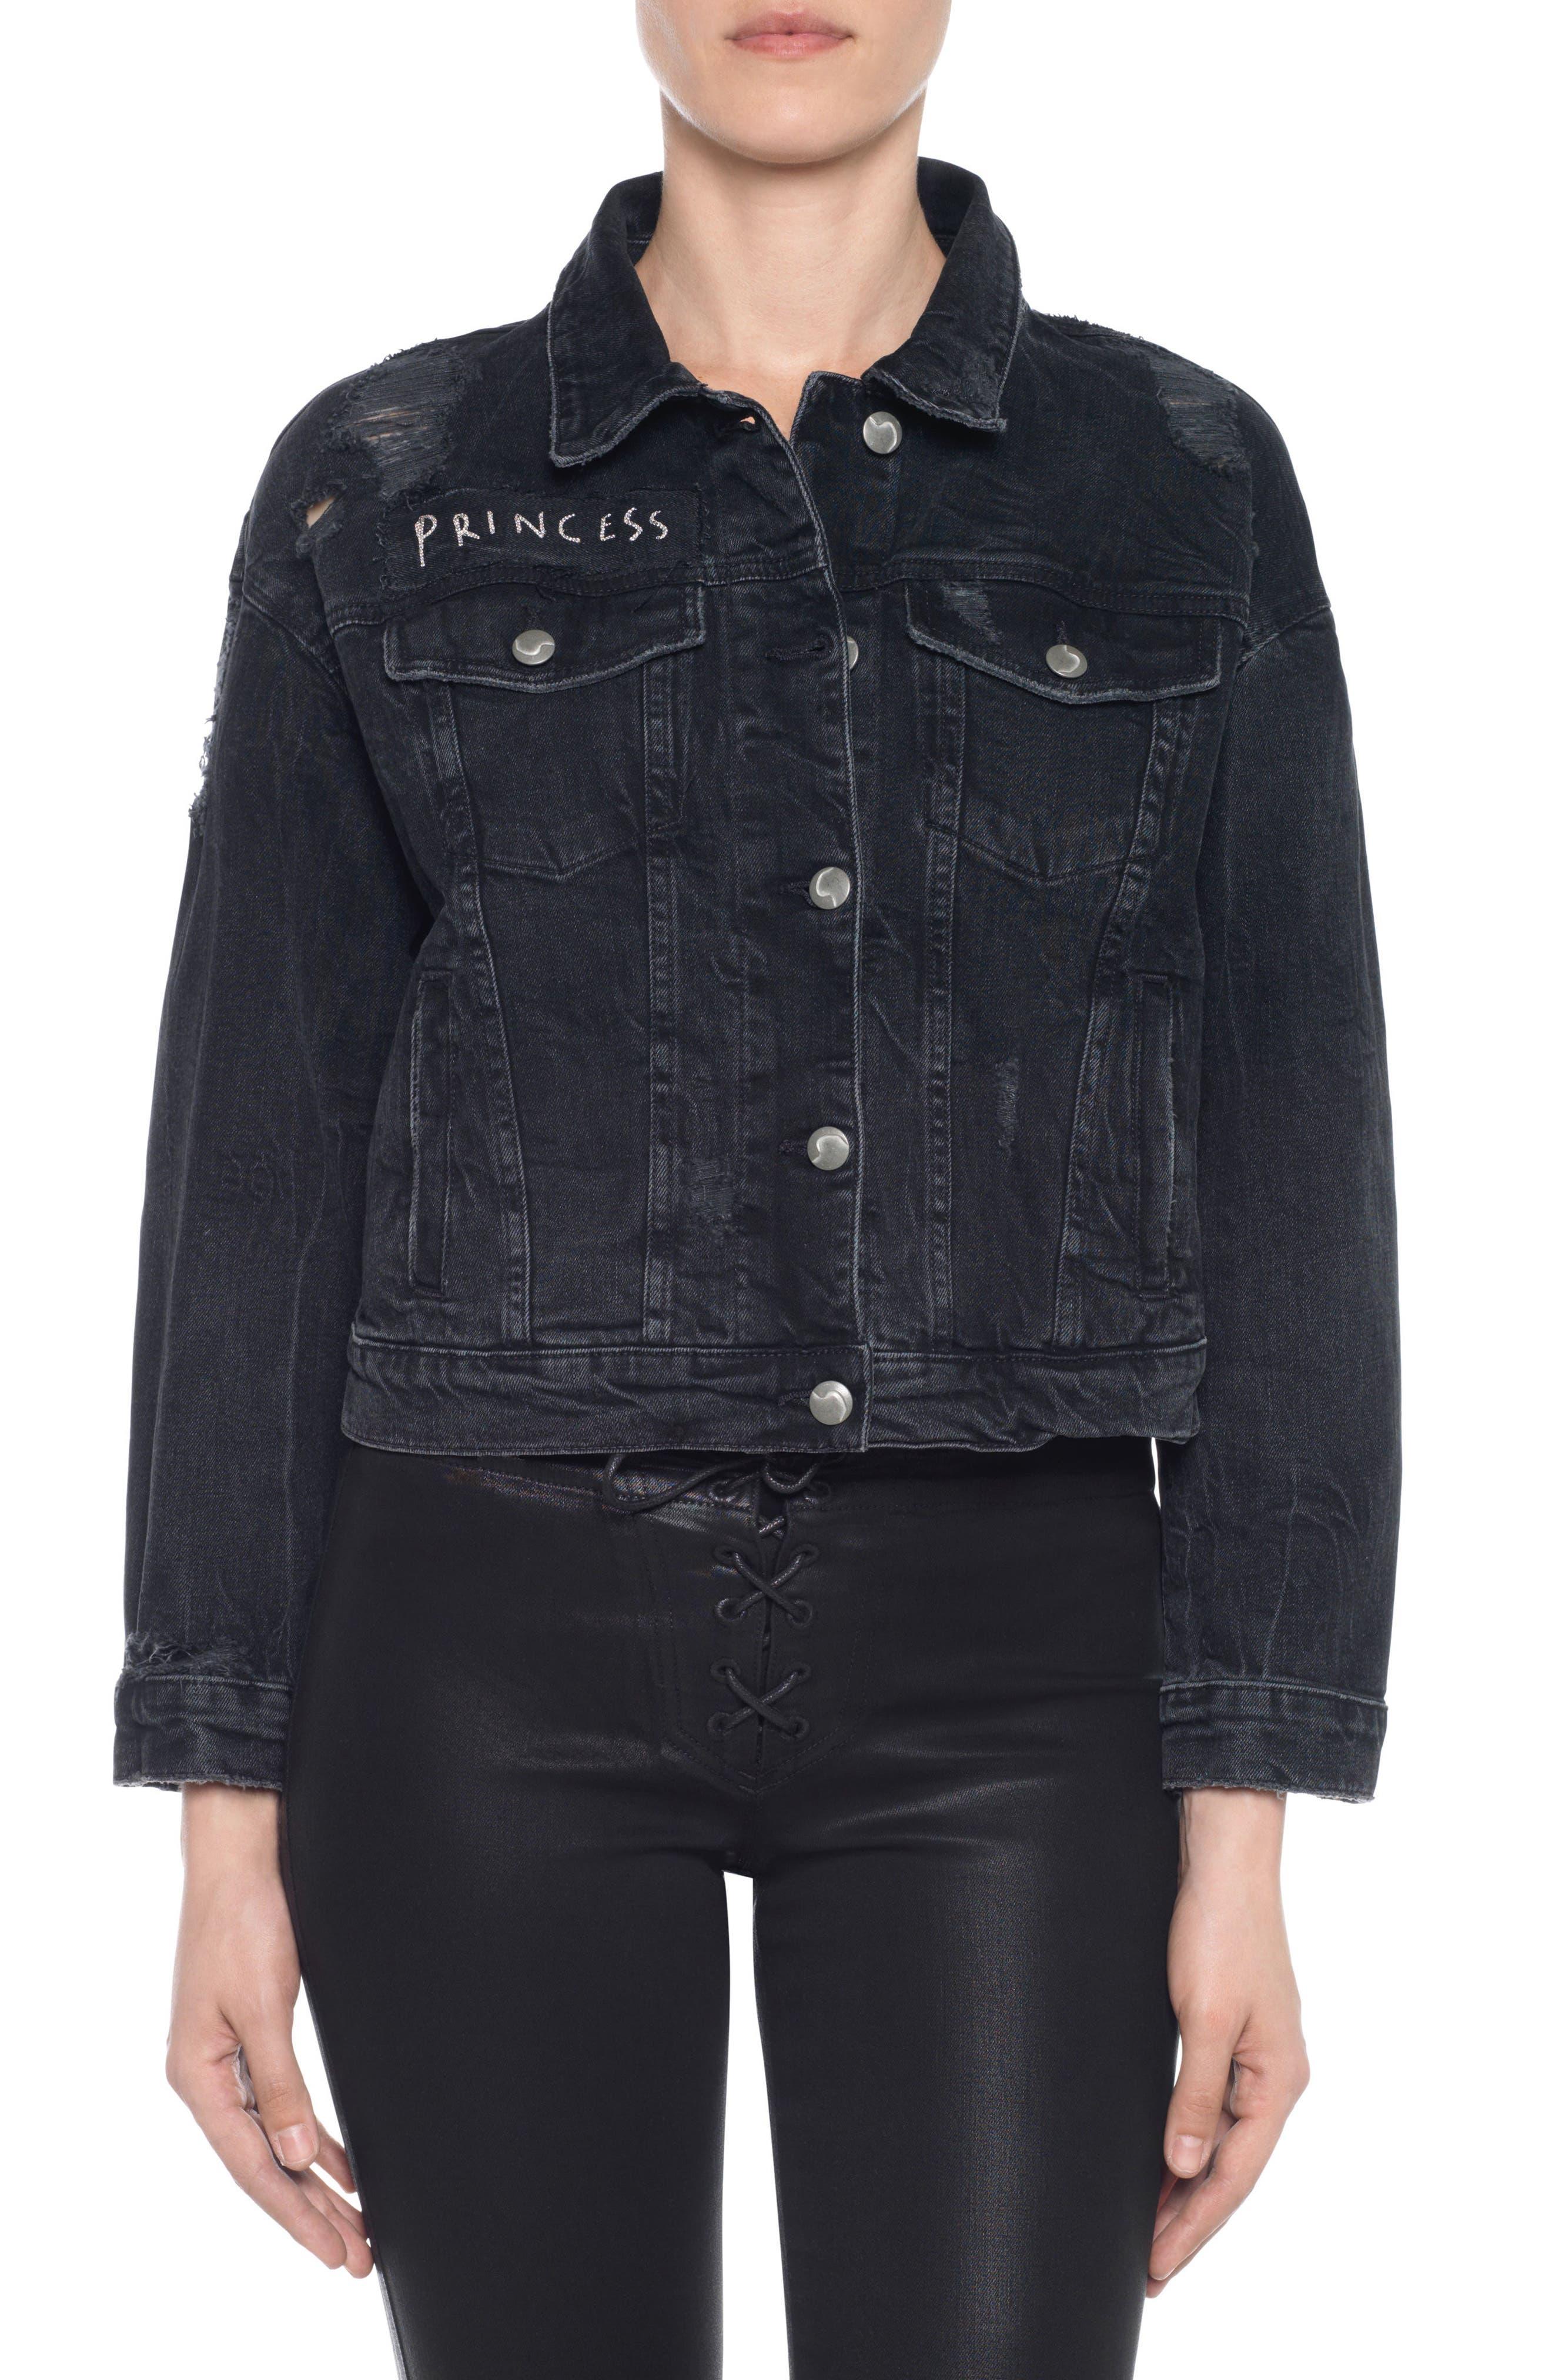 Taylor Hill x Joe's Princess Denim Jacket